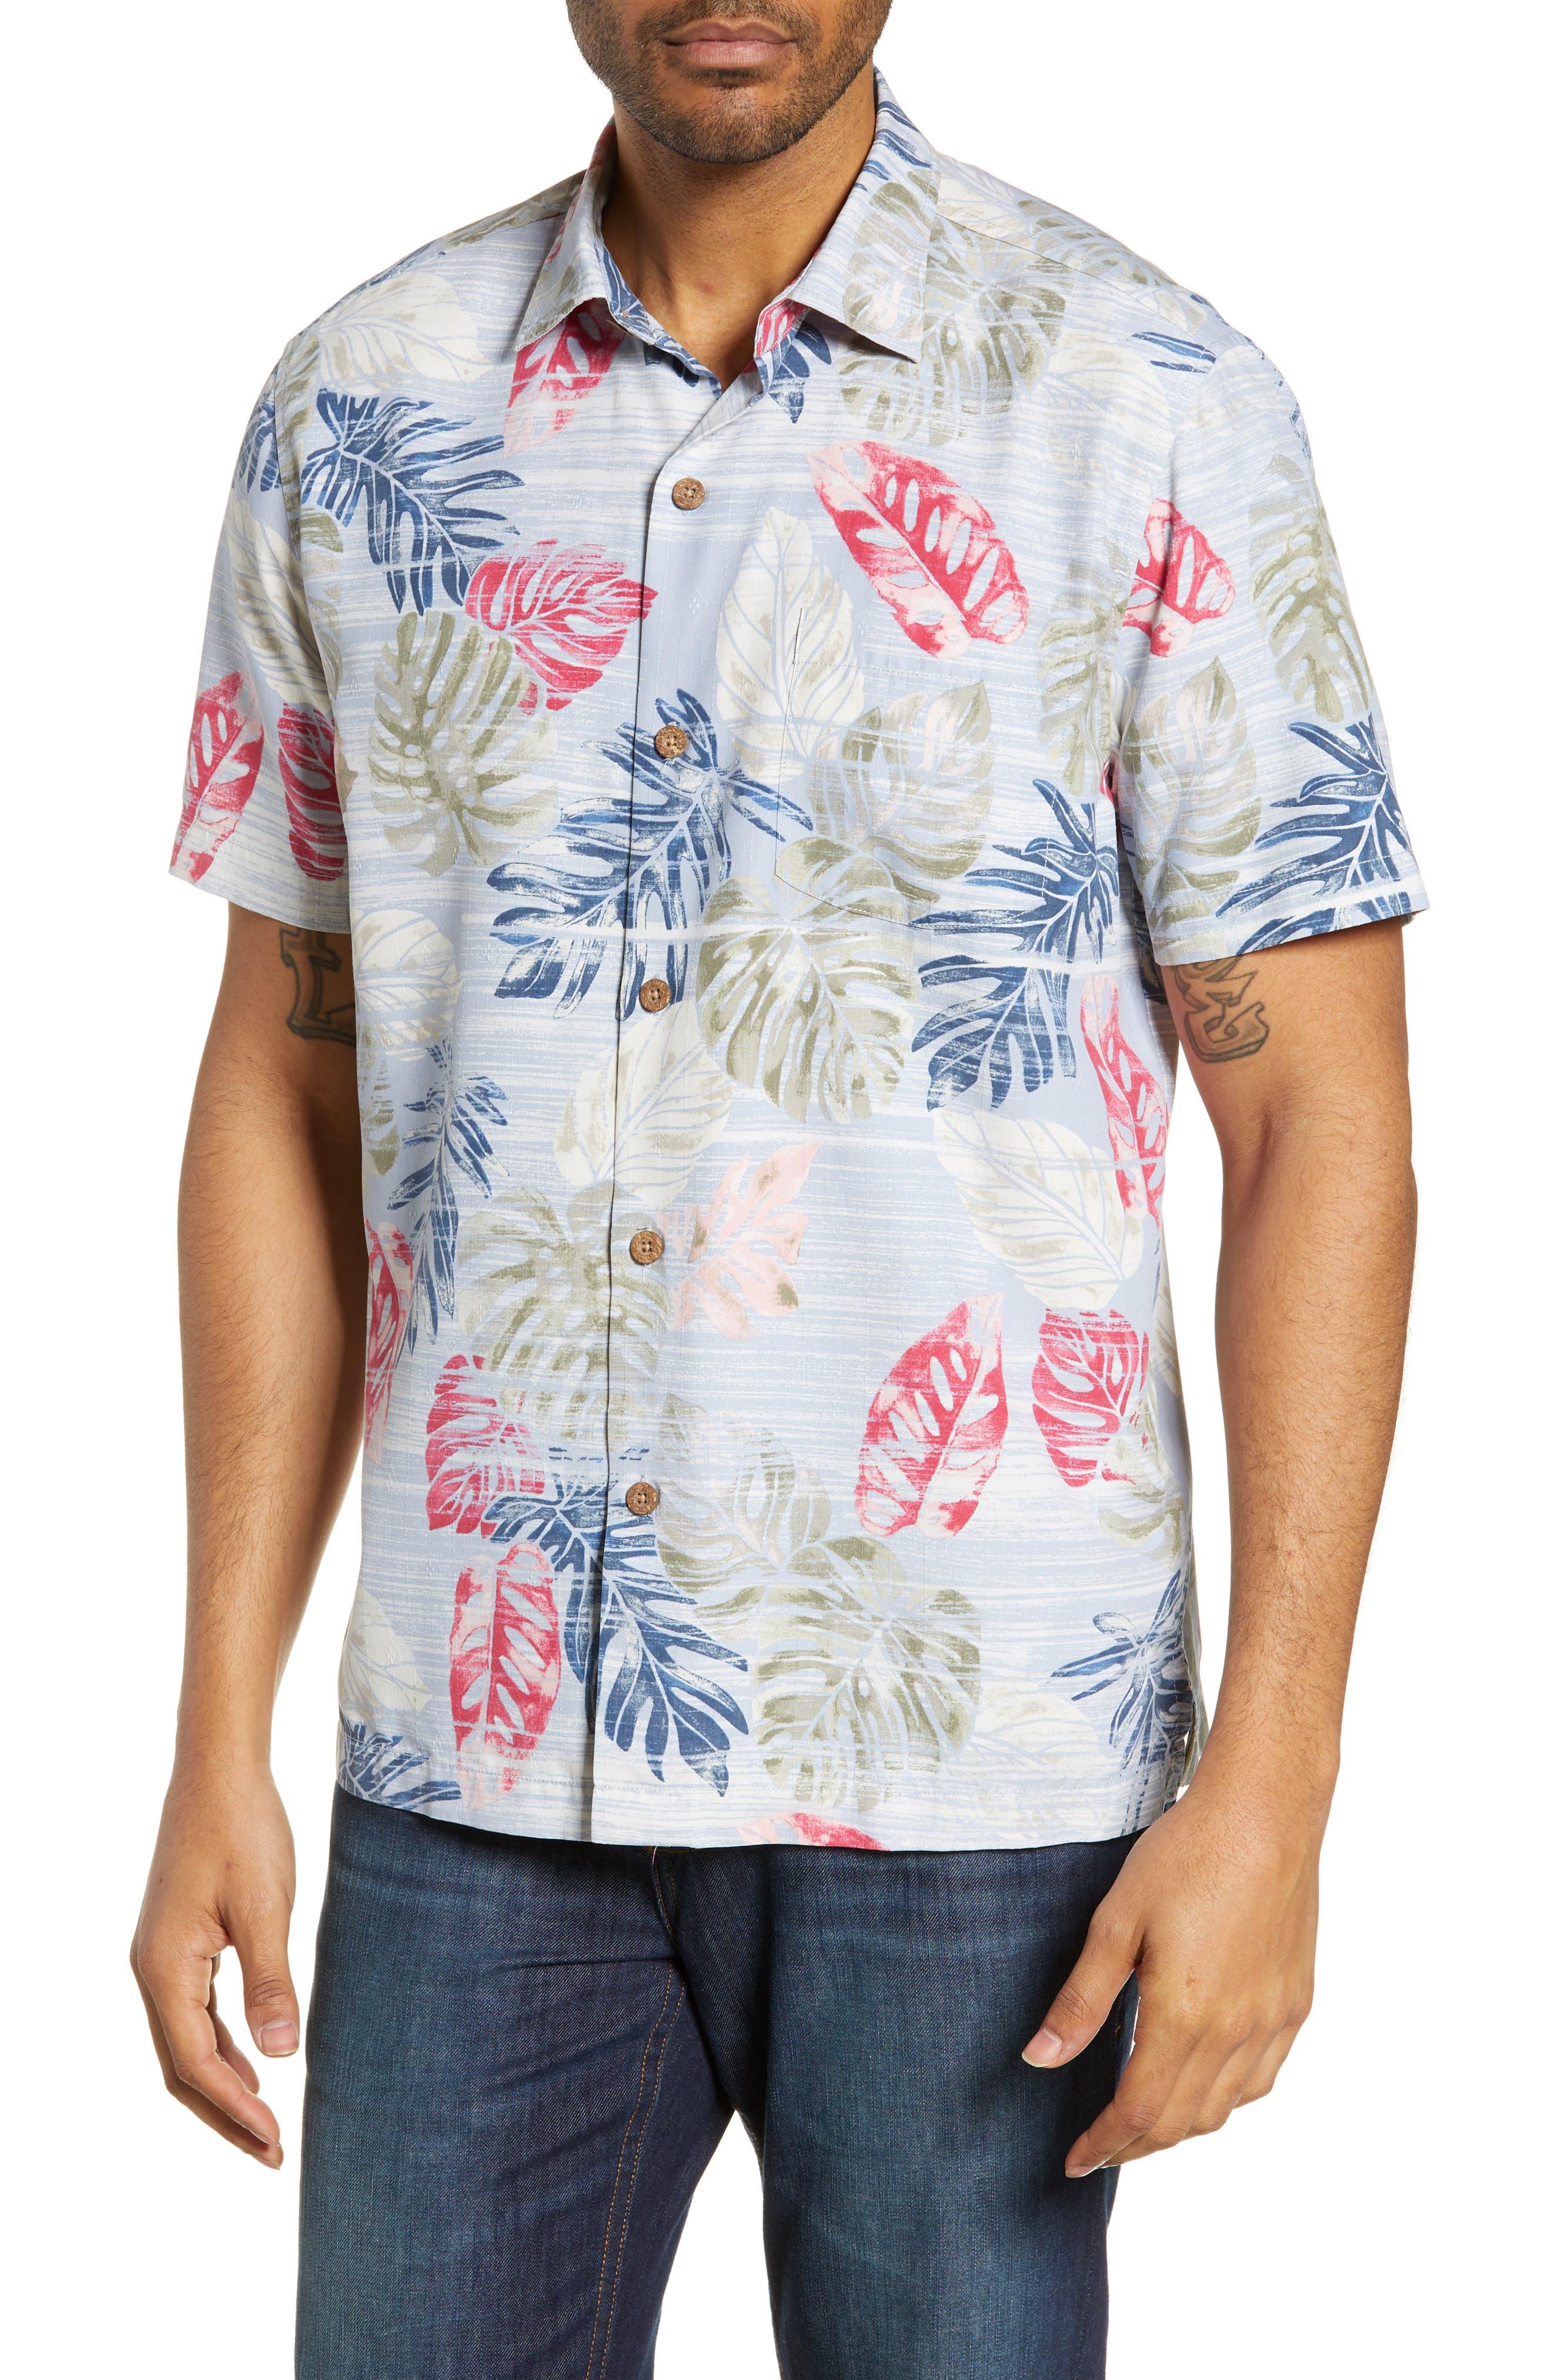 TOMMY BAHAMA Botanica Sketch Silk Blend Shirt, Main, color, CANYON SKY